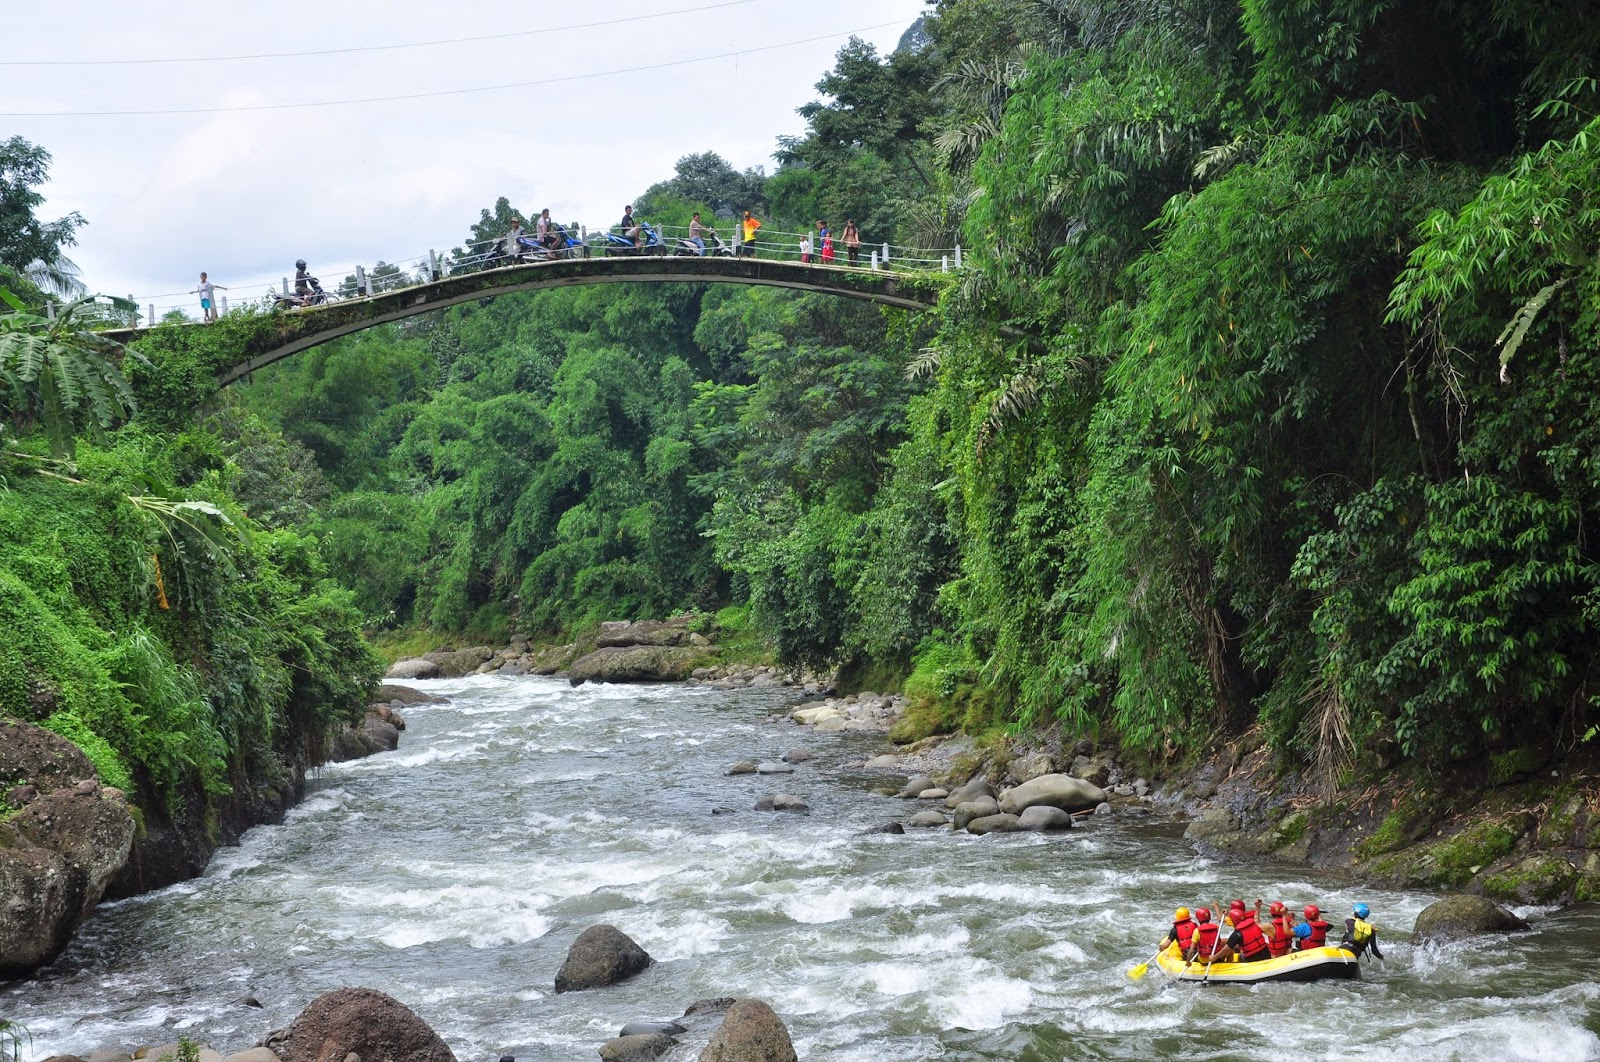 Tempat Wisata Desa Wisata Lolong Pekalongan